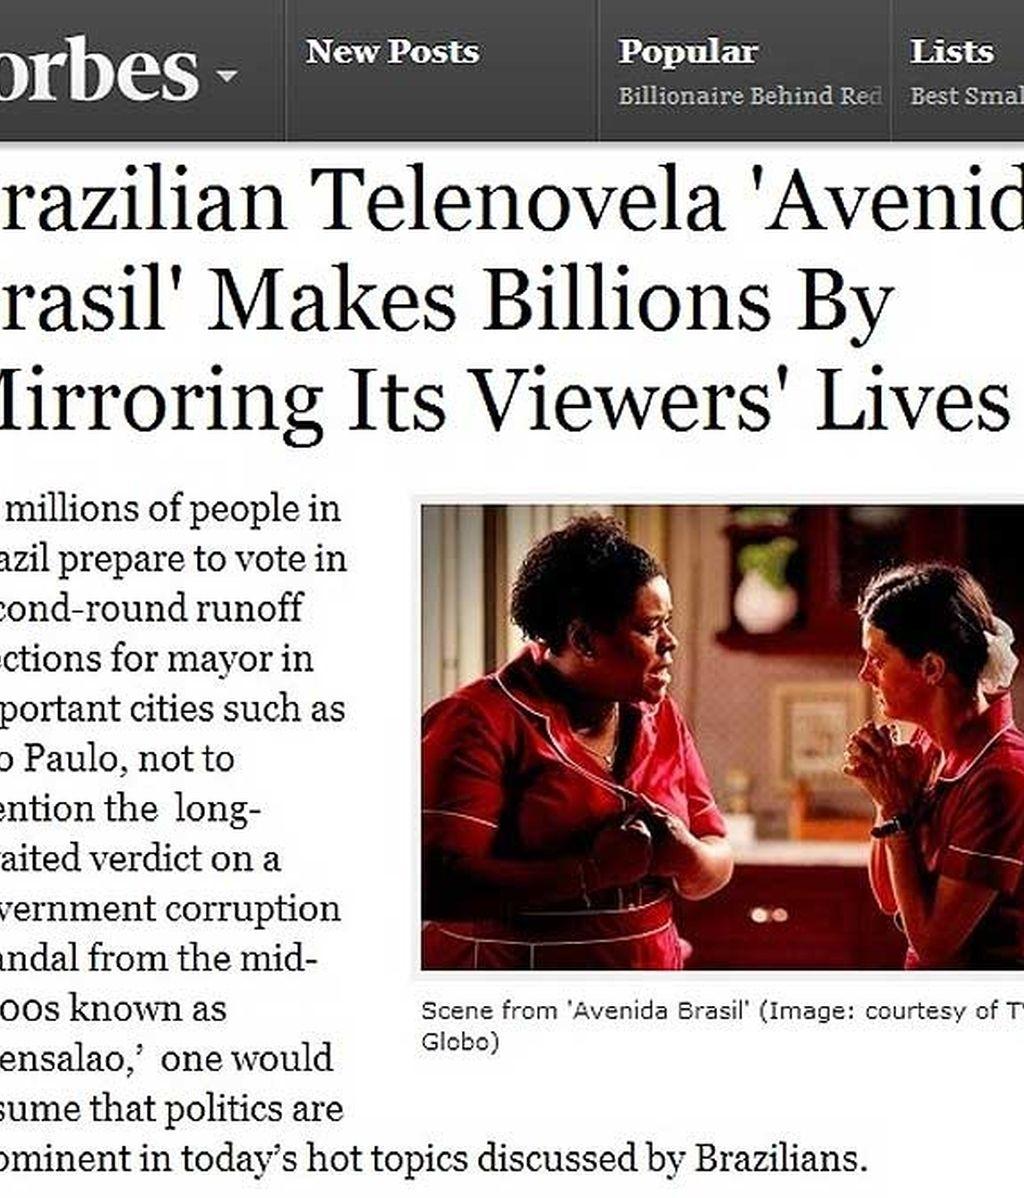 Lo que no sabías de 'Avenida Brasil'